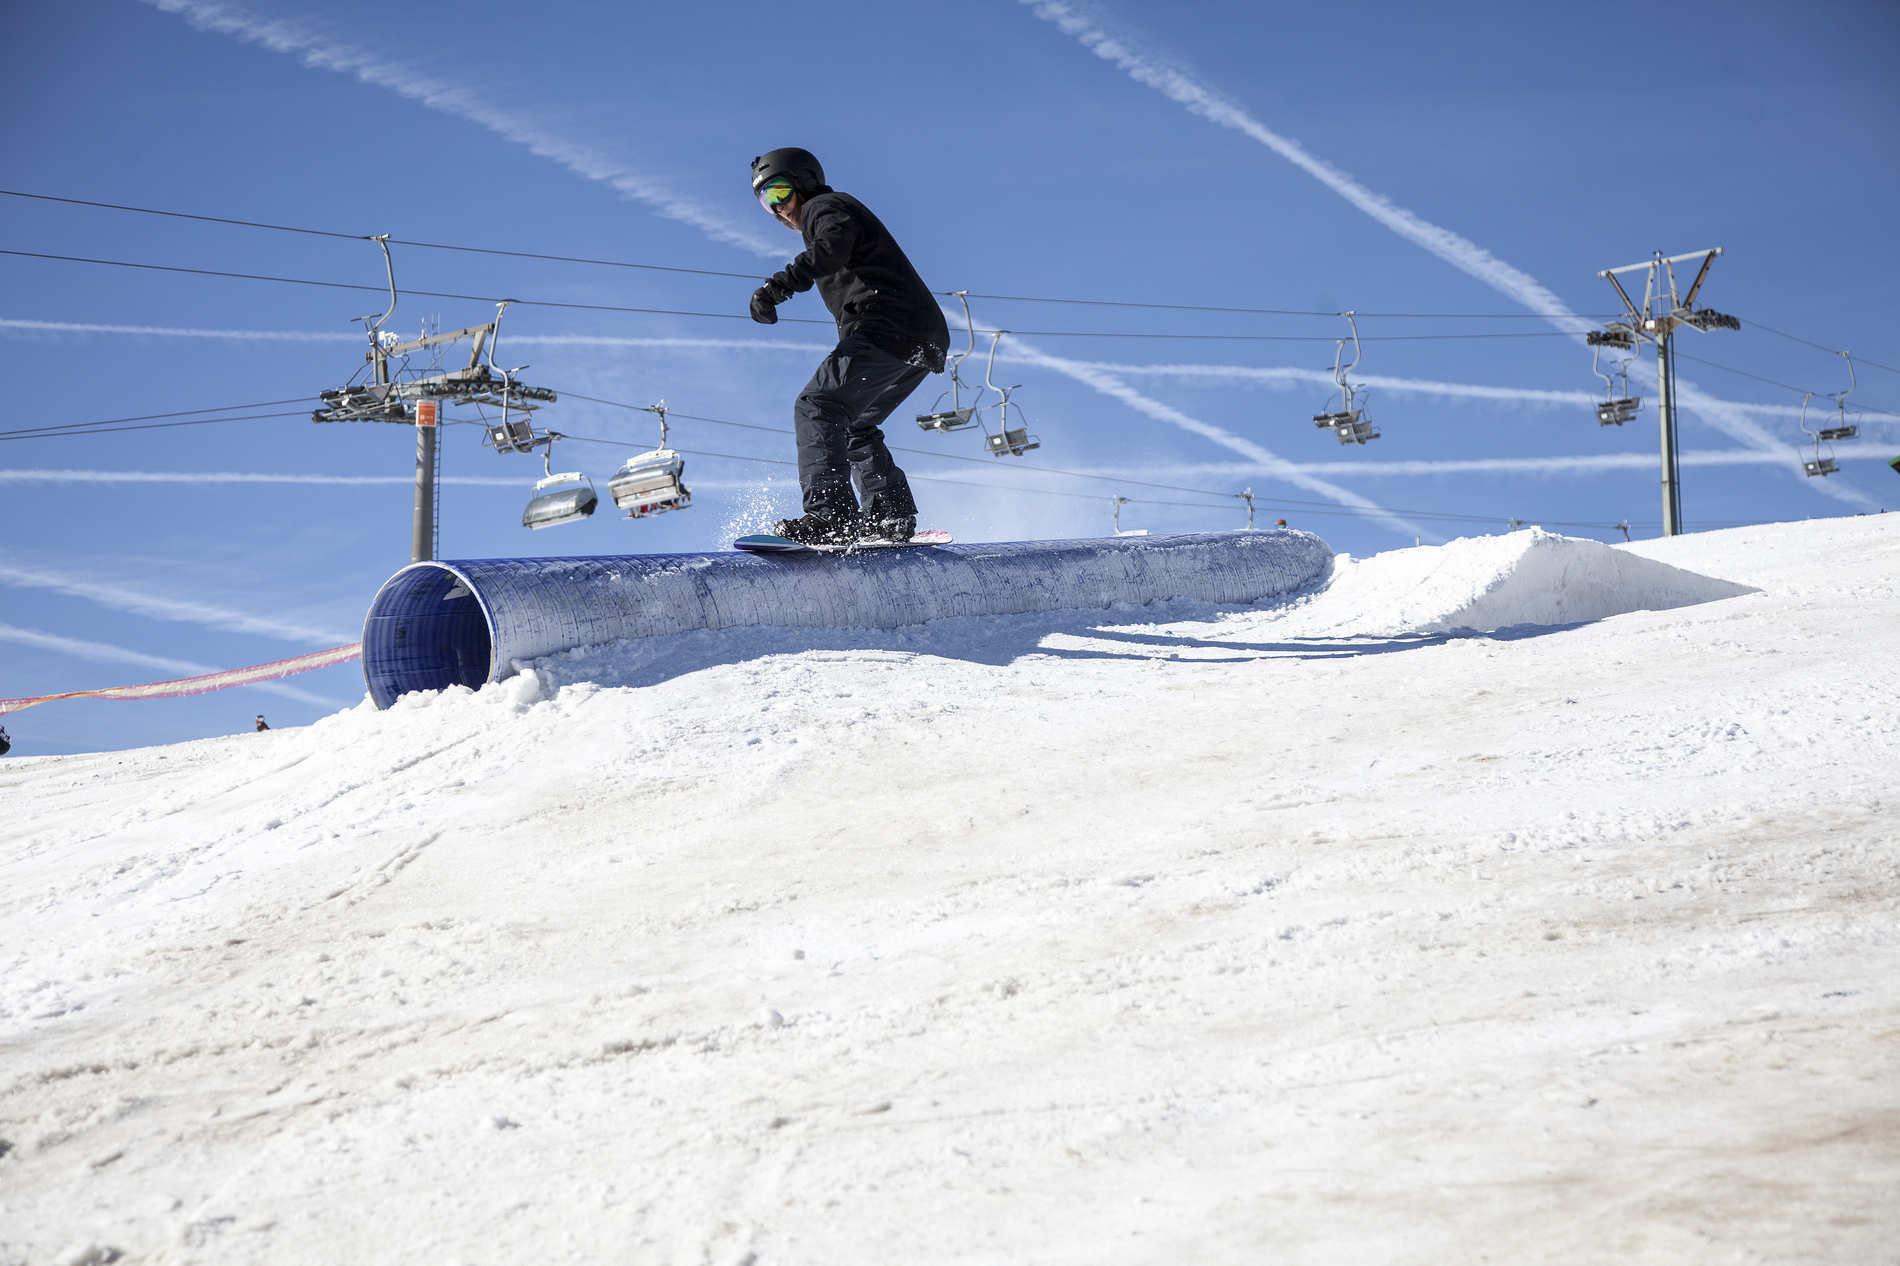 web snowpark feldberg 25 02 2017 action sb yasmin kazemi martin herrmann qparks 14